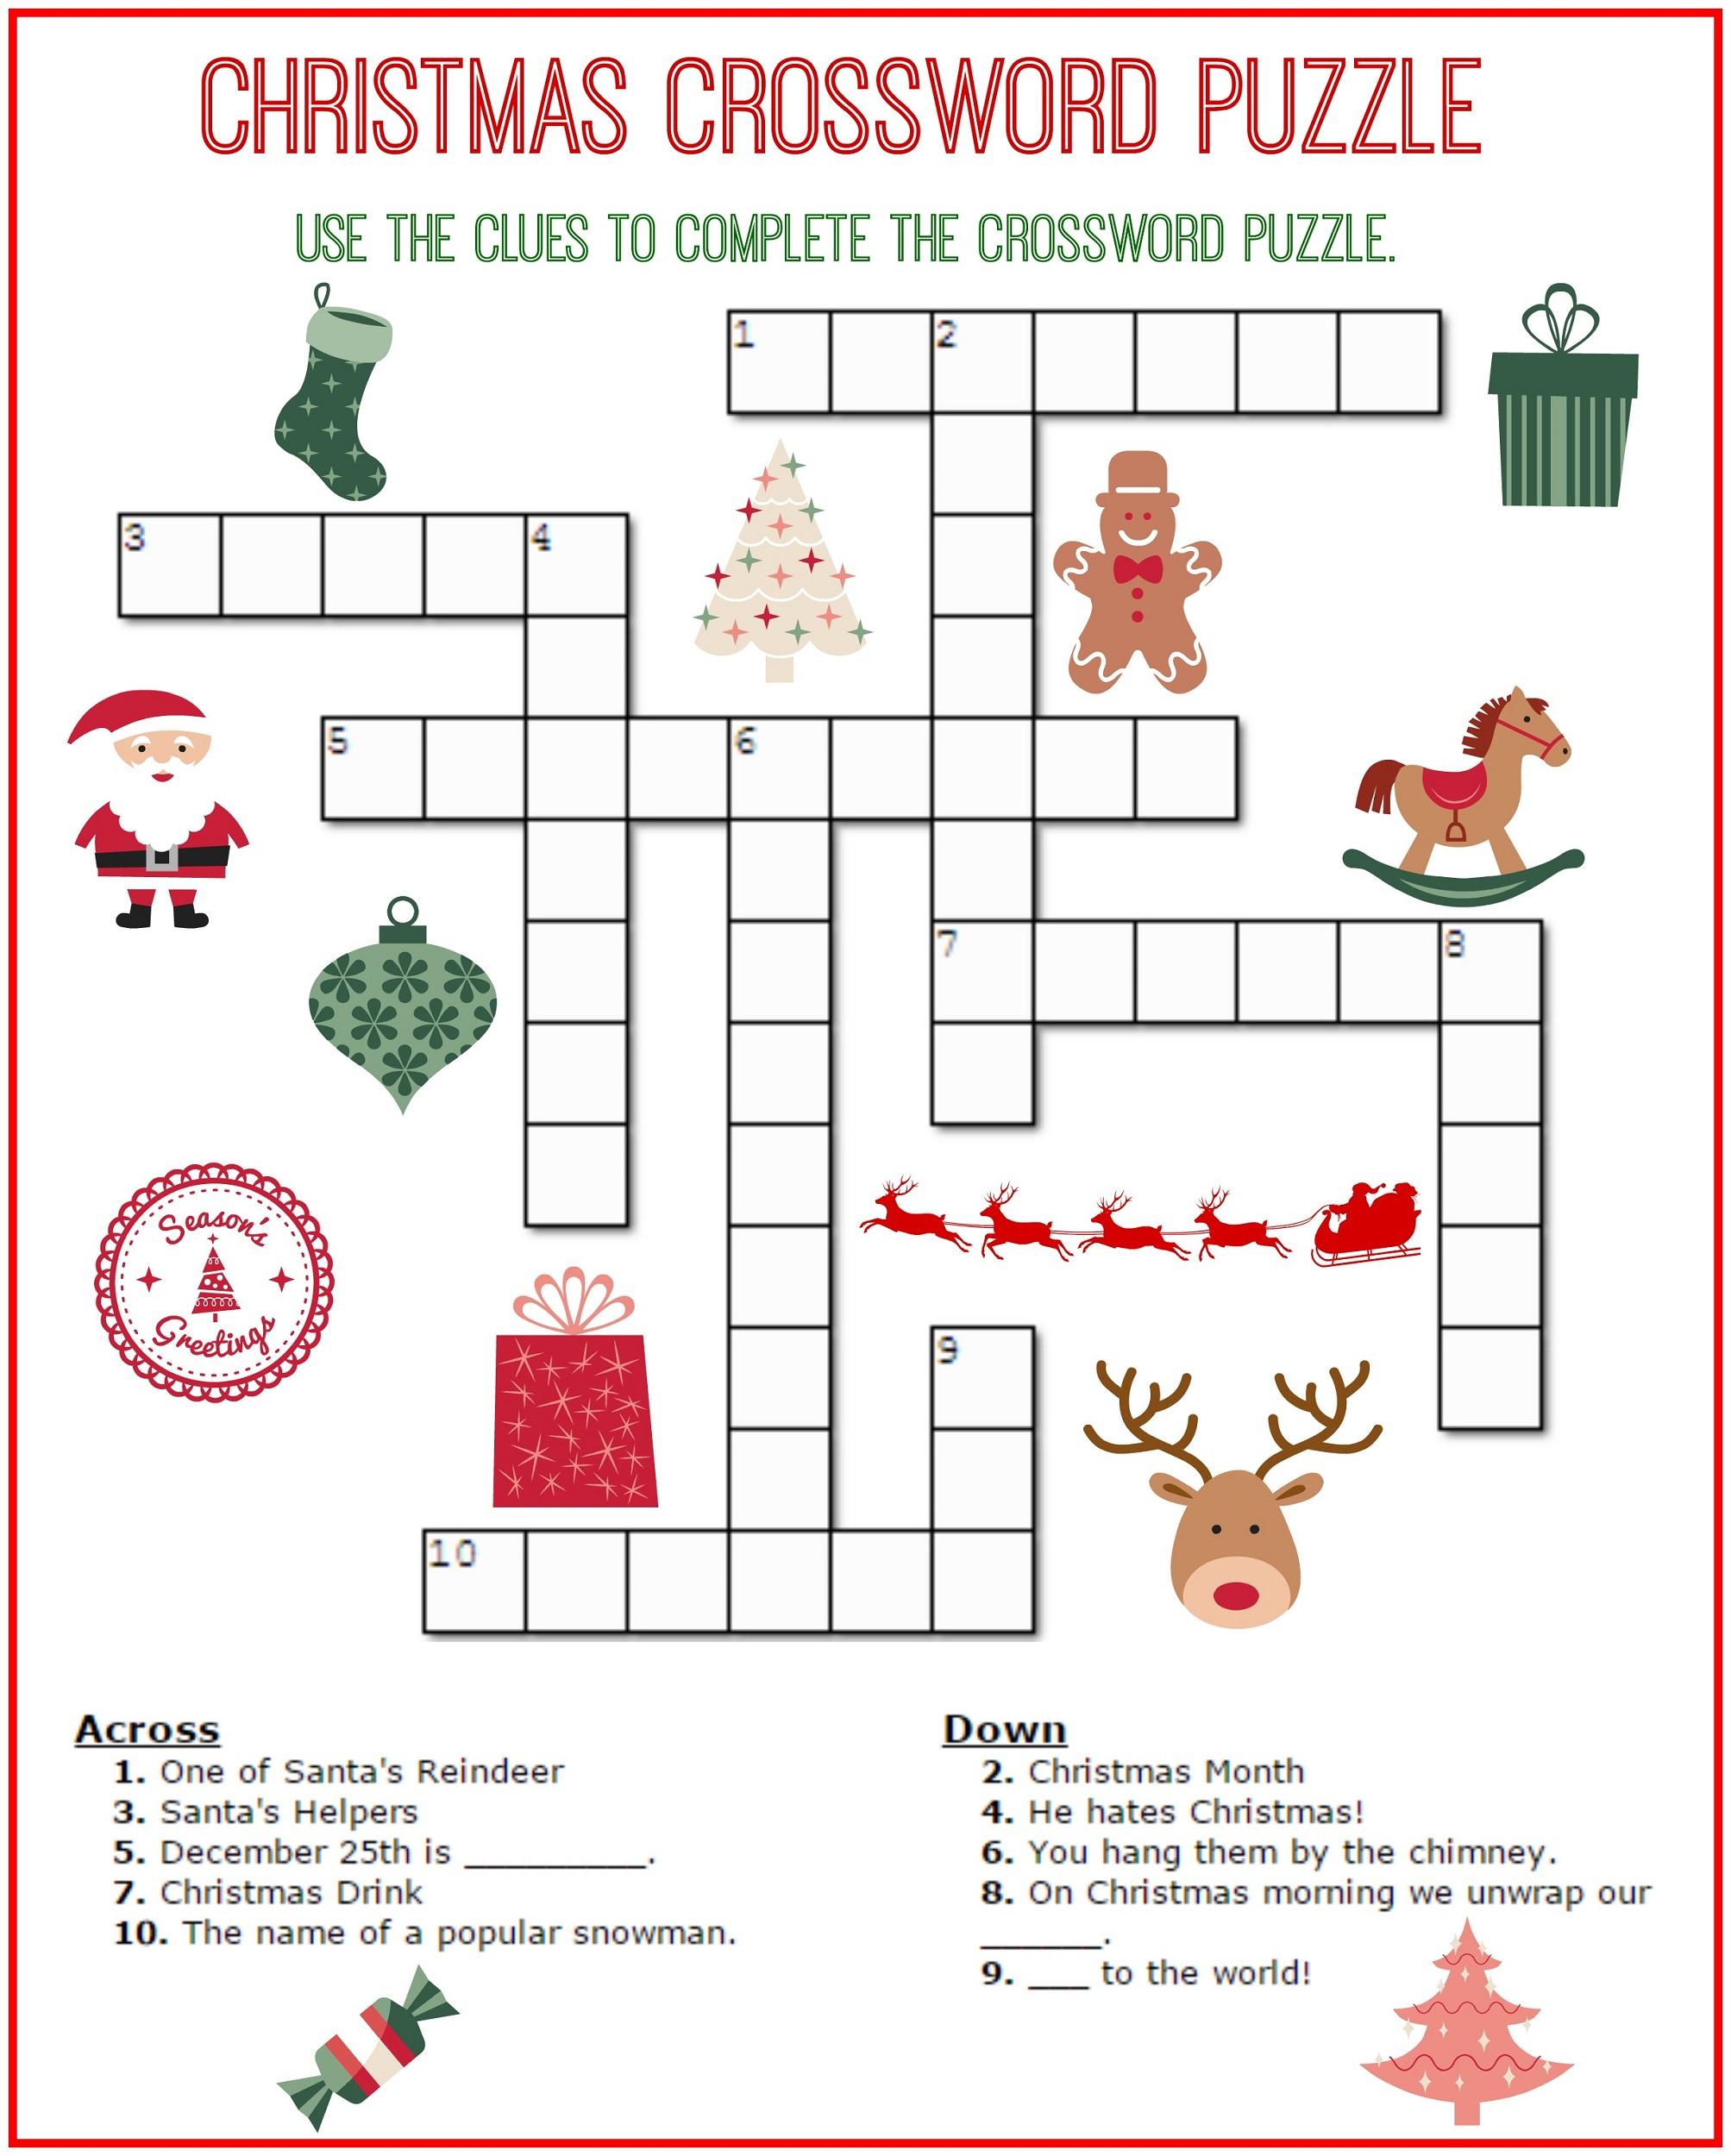 Crossword Puzzle Kids Printable 2017   Kiddo Shelter - Free Easy - Printable Crossword Puzzles For 5 Year Olds